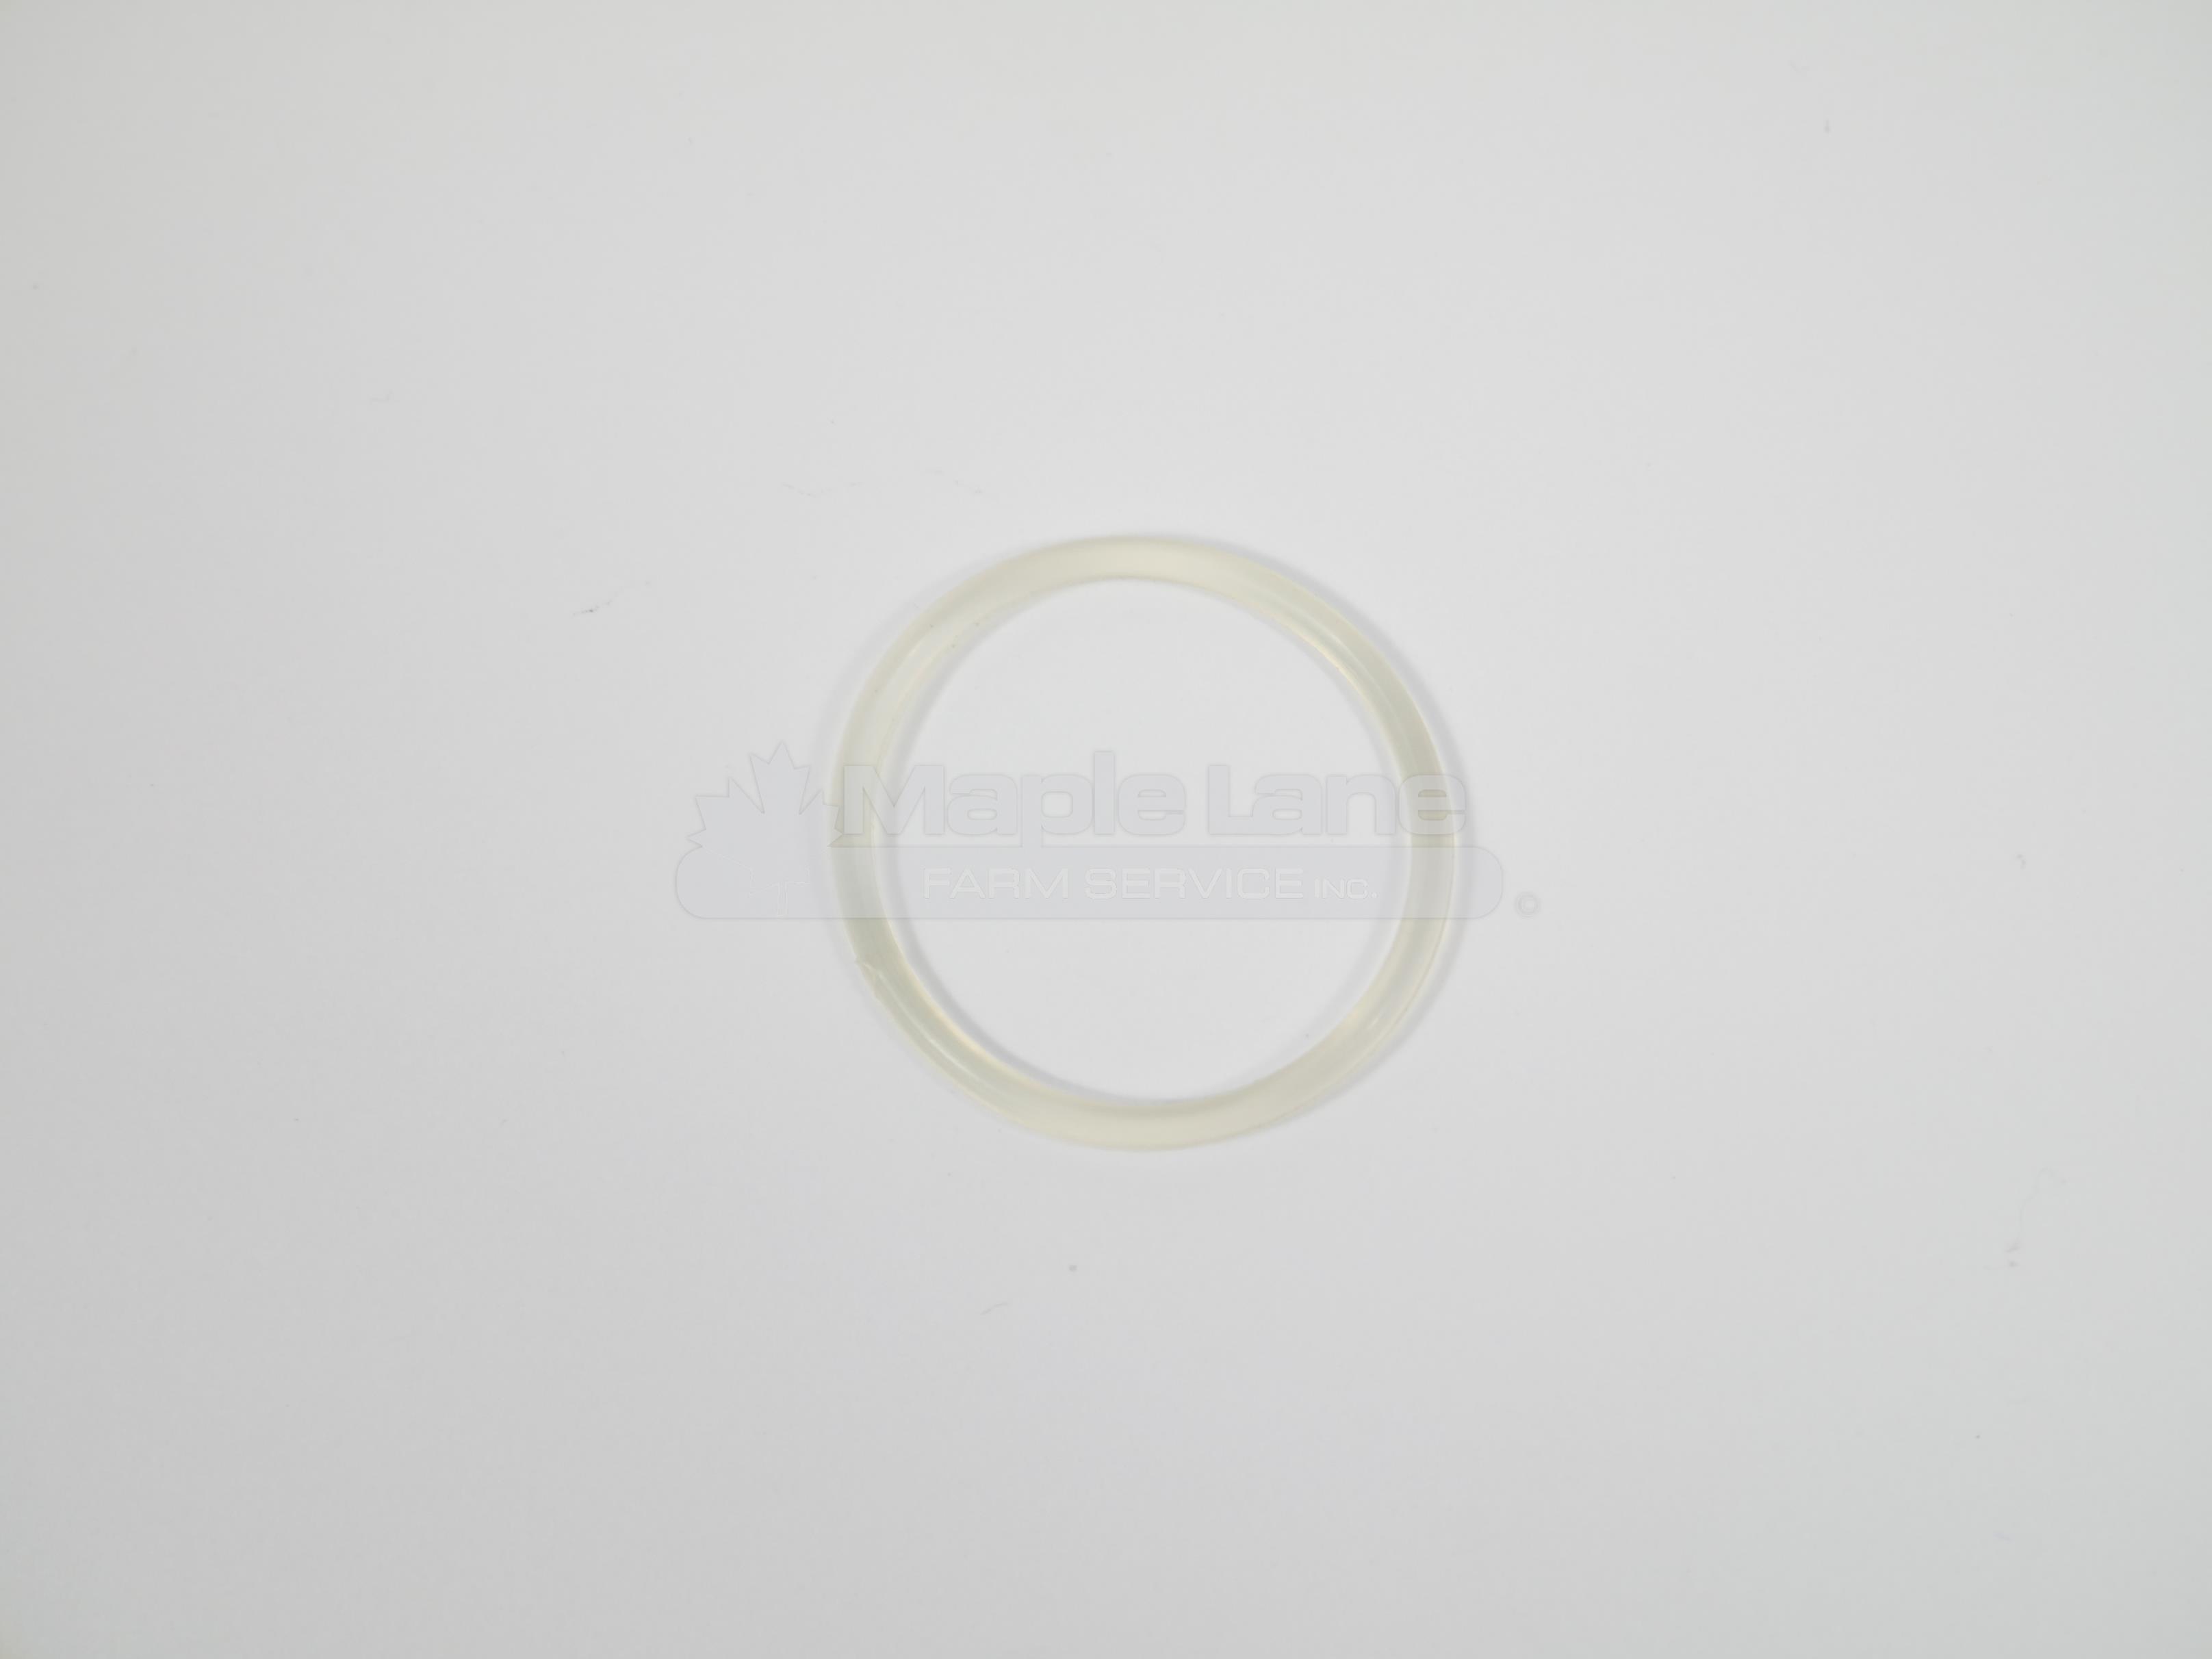 330735 O-Ring